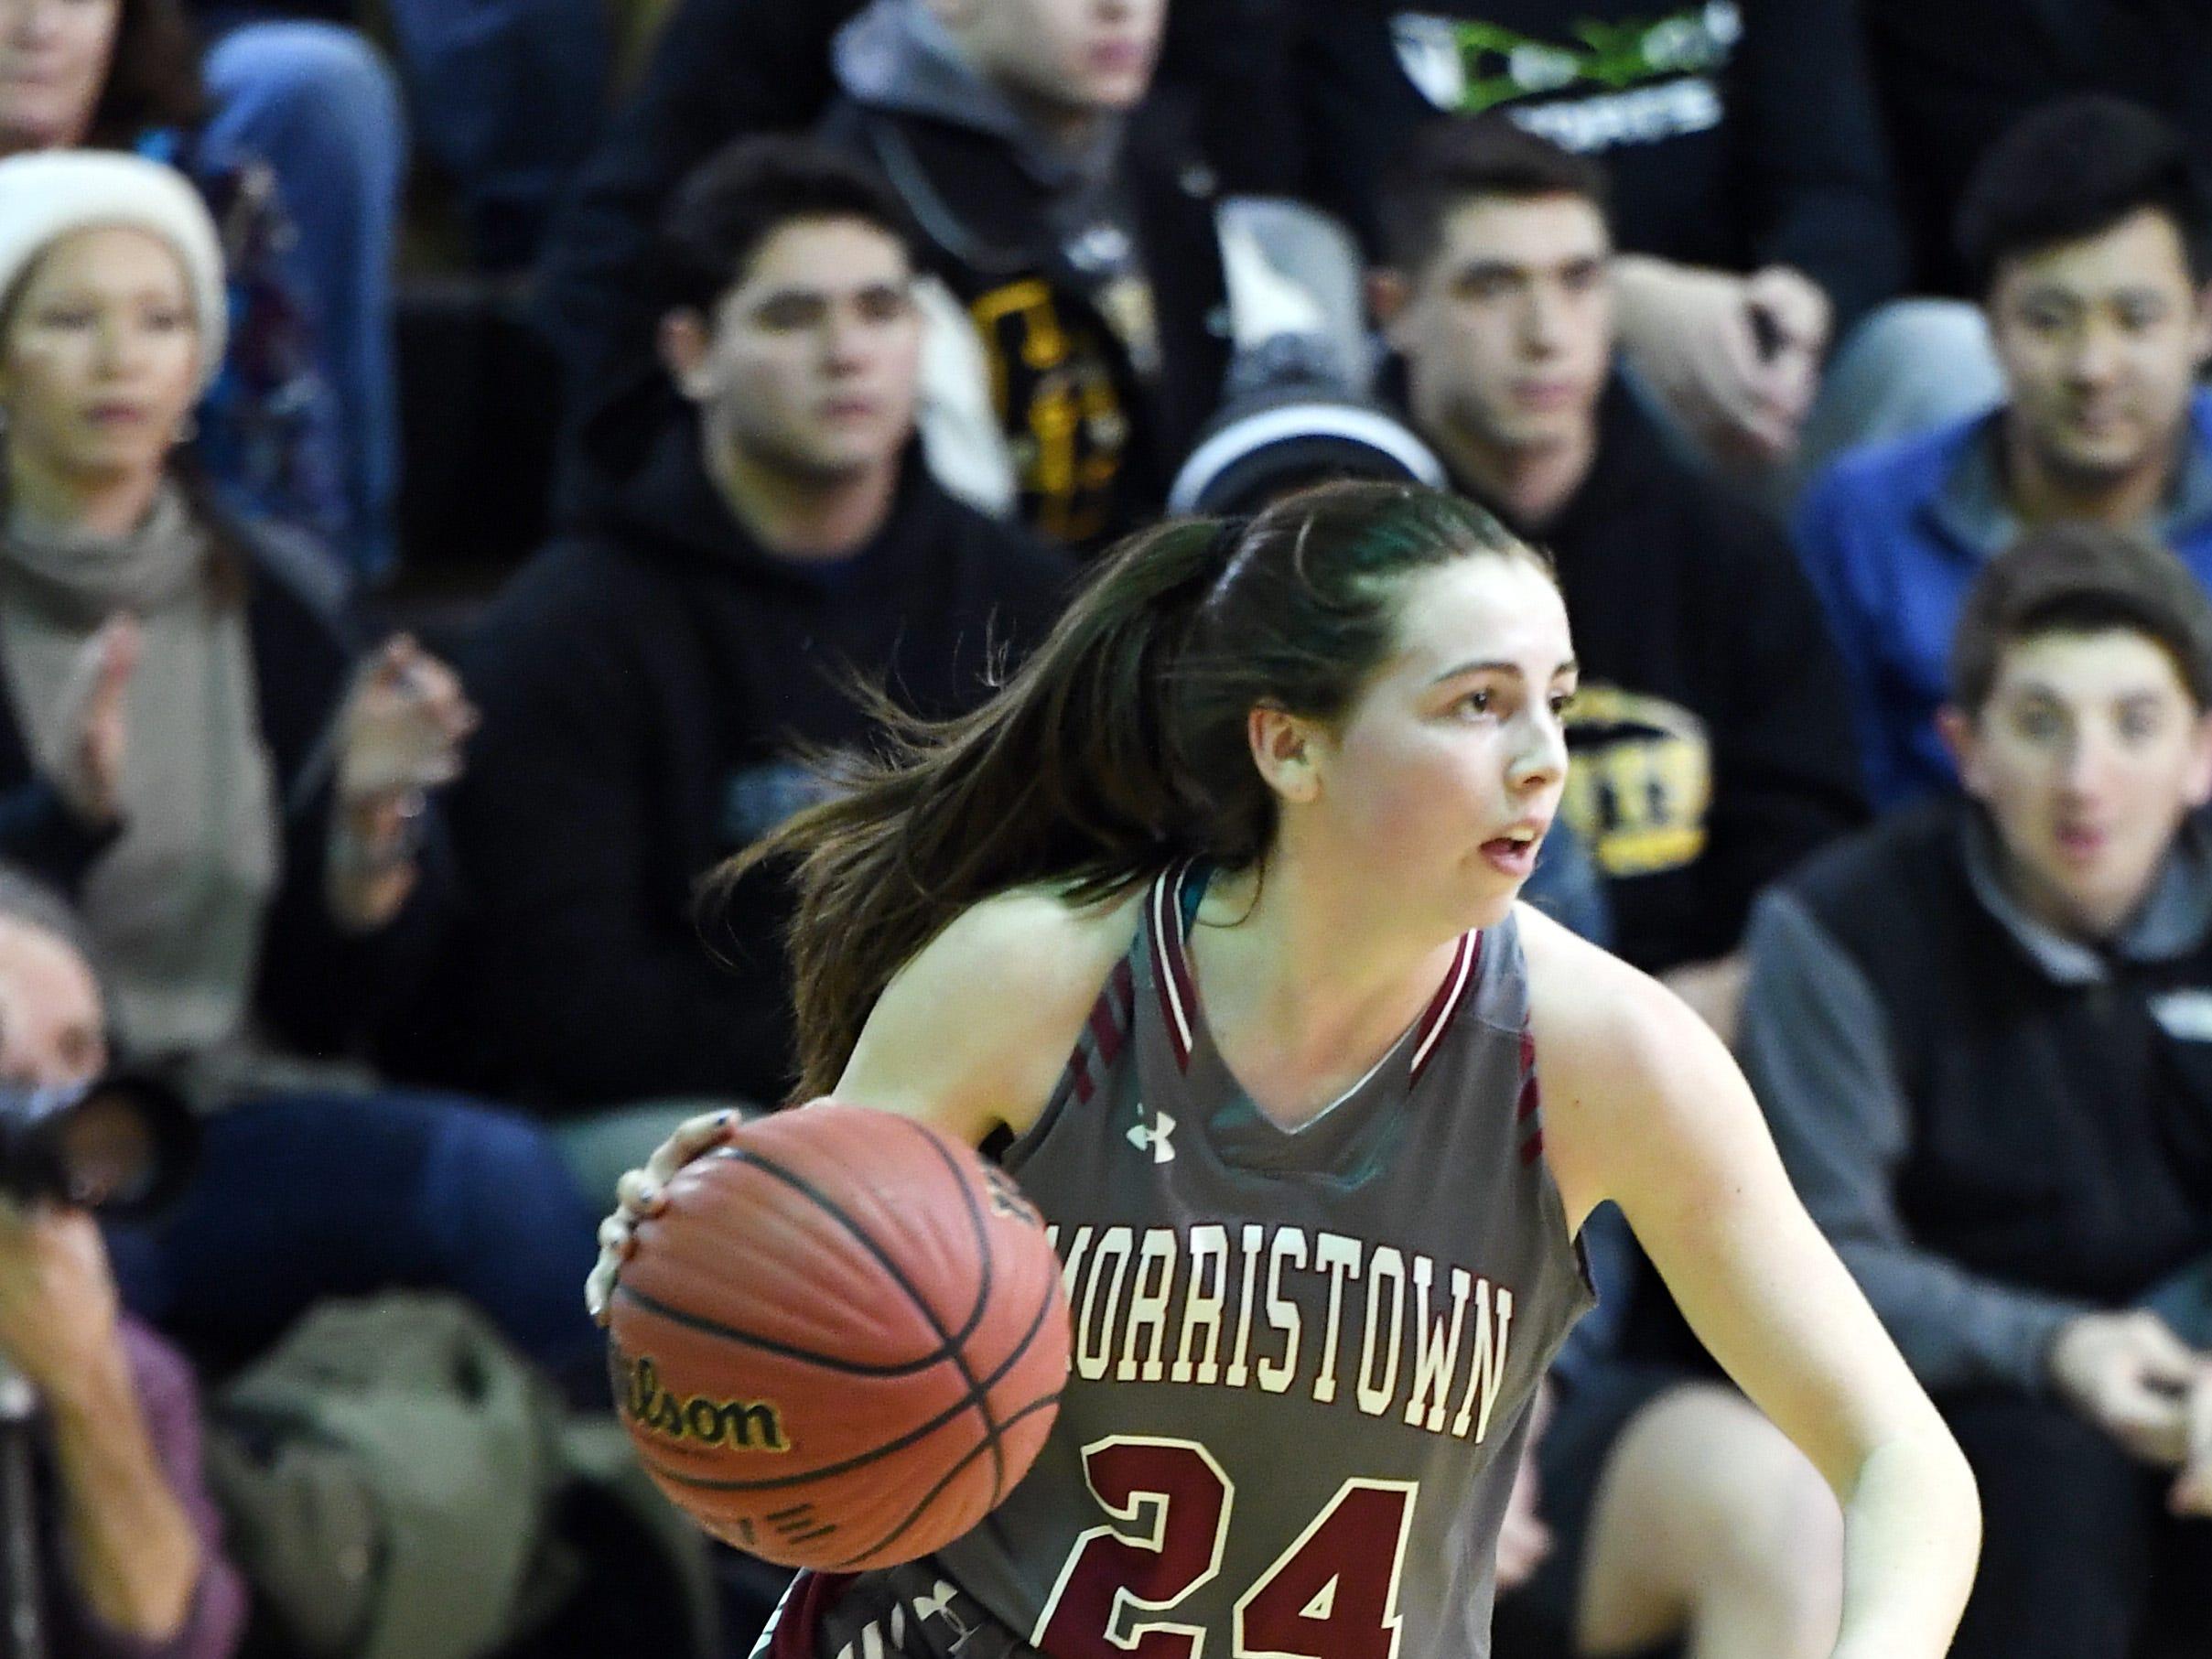 Morristown-Beard girls basketball at Hanover Park on Friday, January 4, 2019. MB #24 Bridget Monaghan.